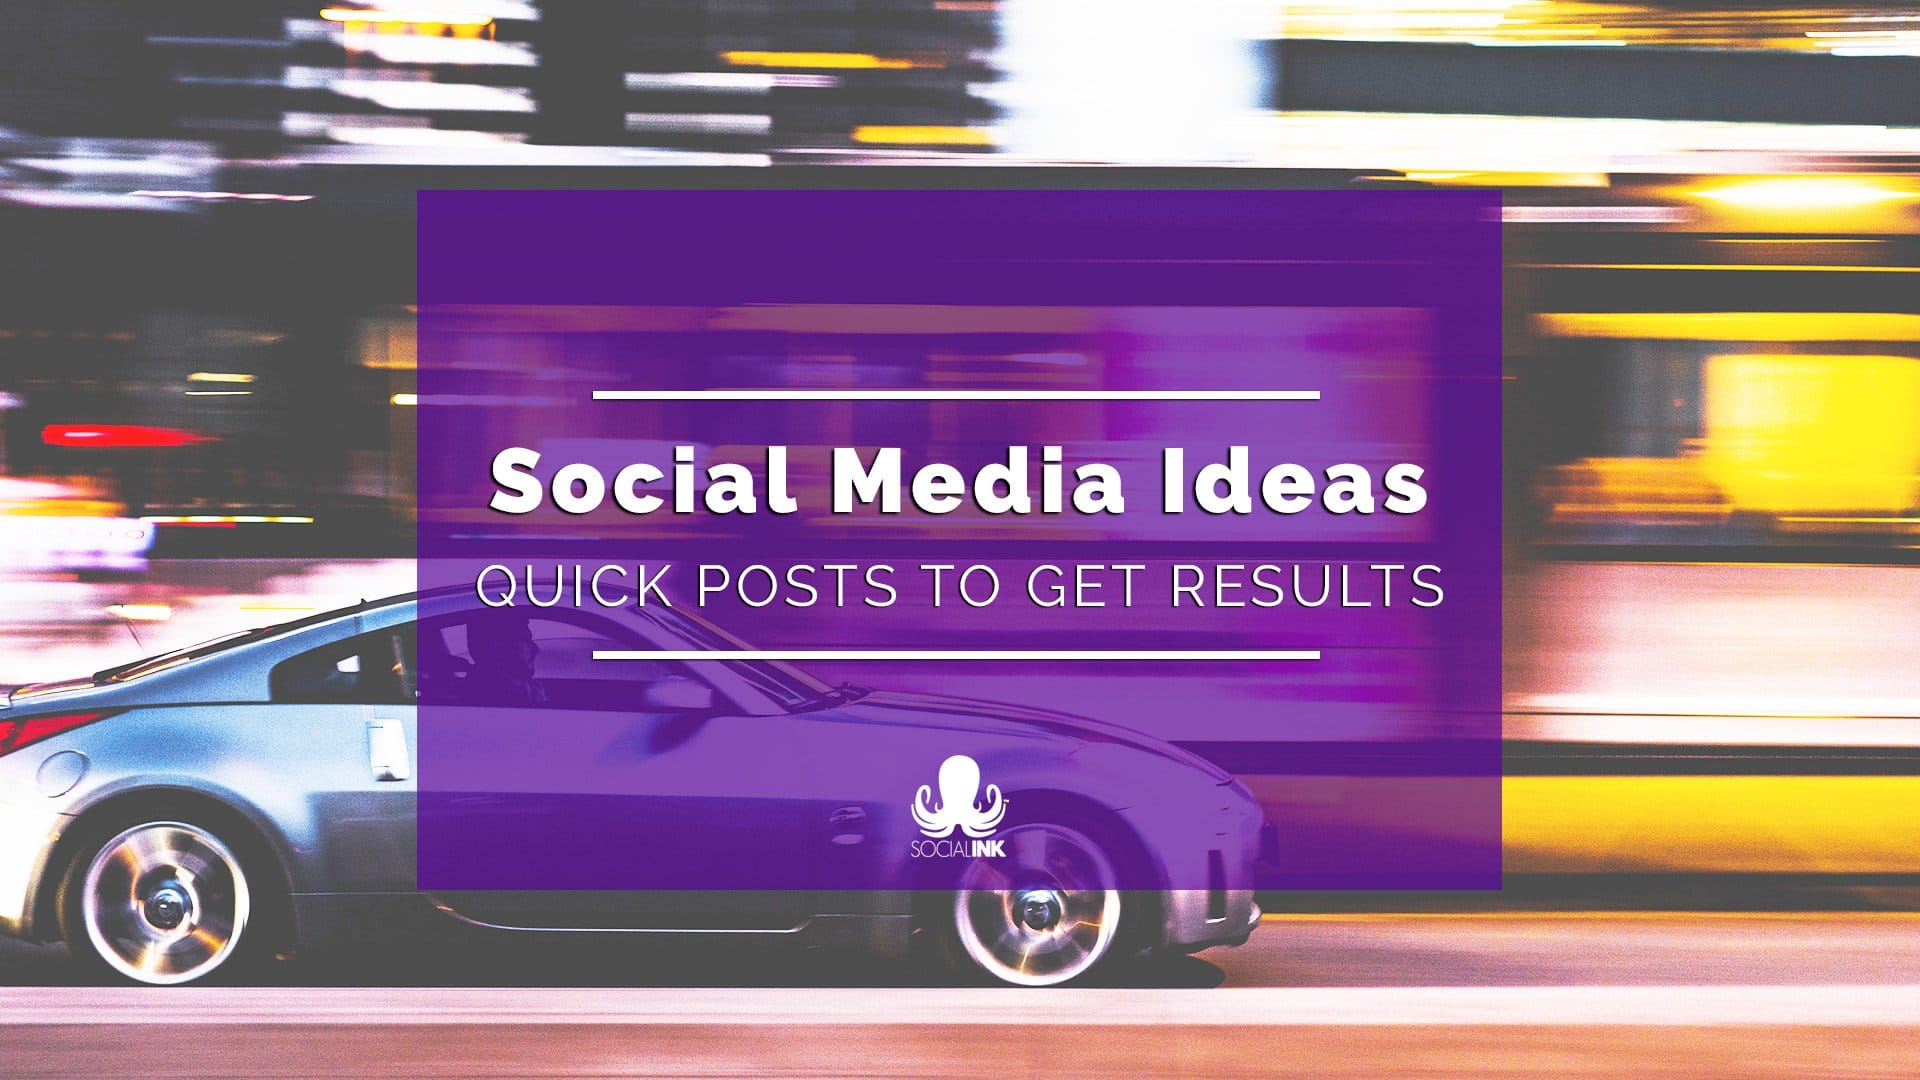 Social Media Content Ideas: 5 Quick Ideas That Get Results